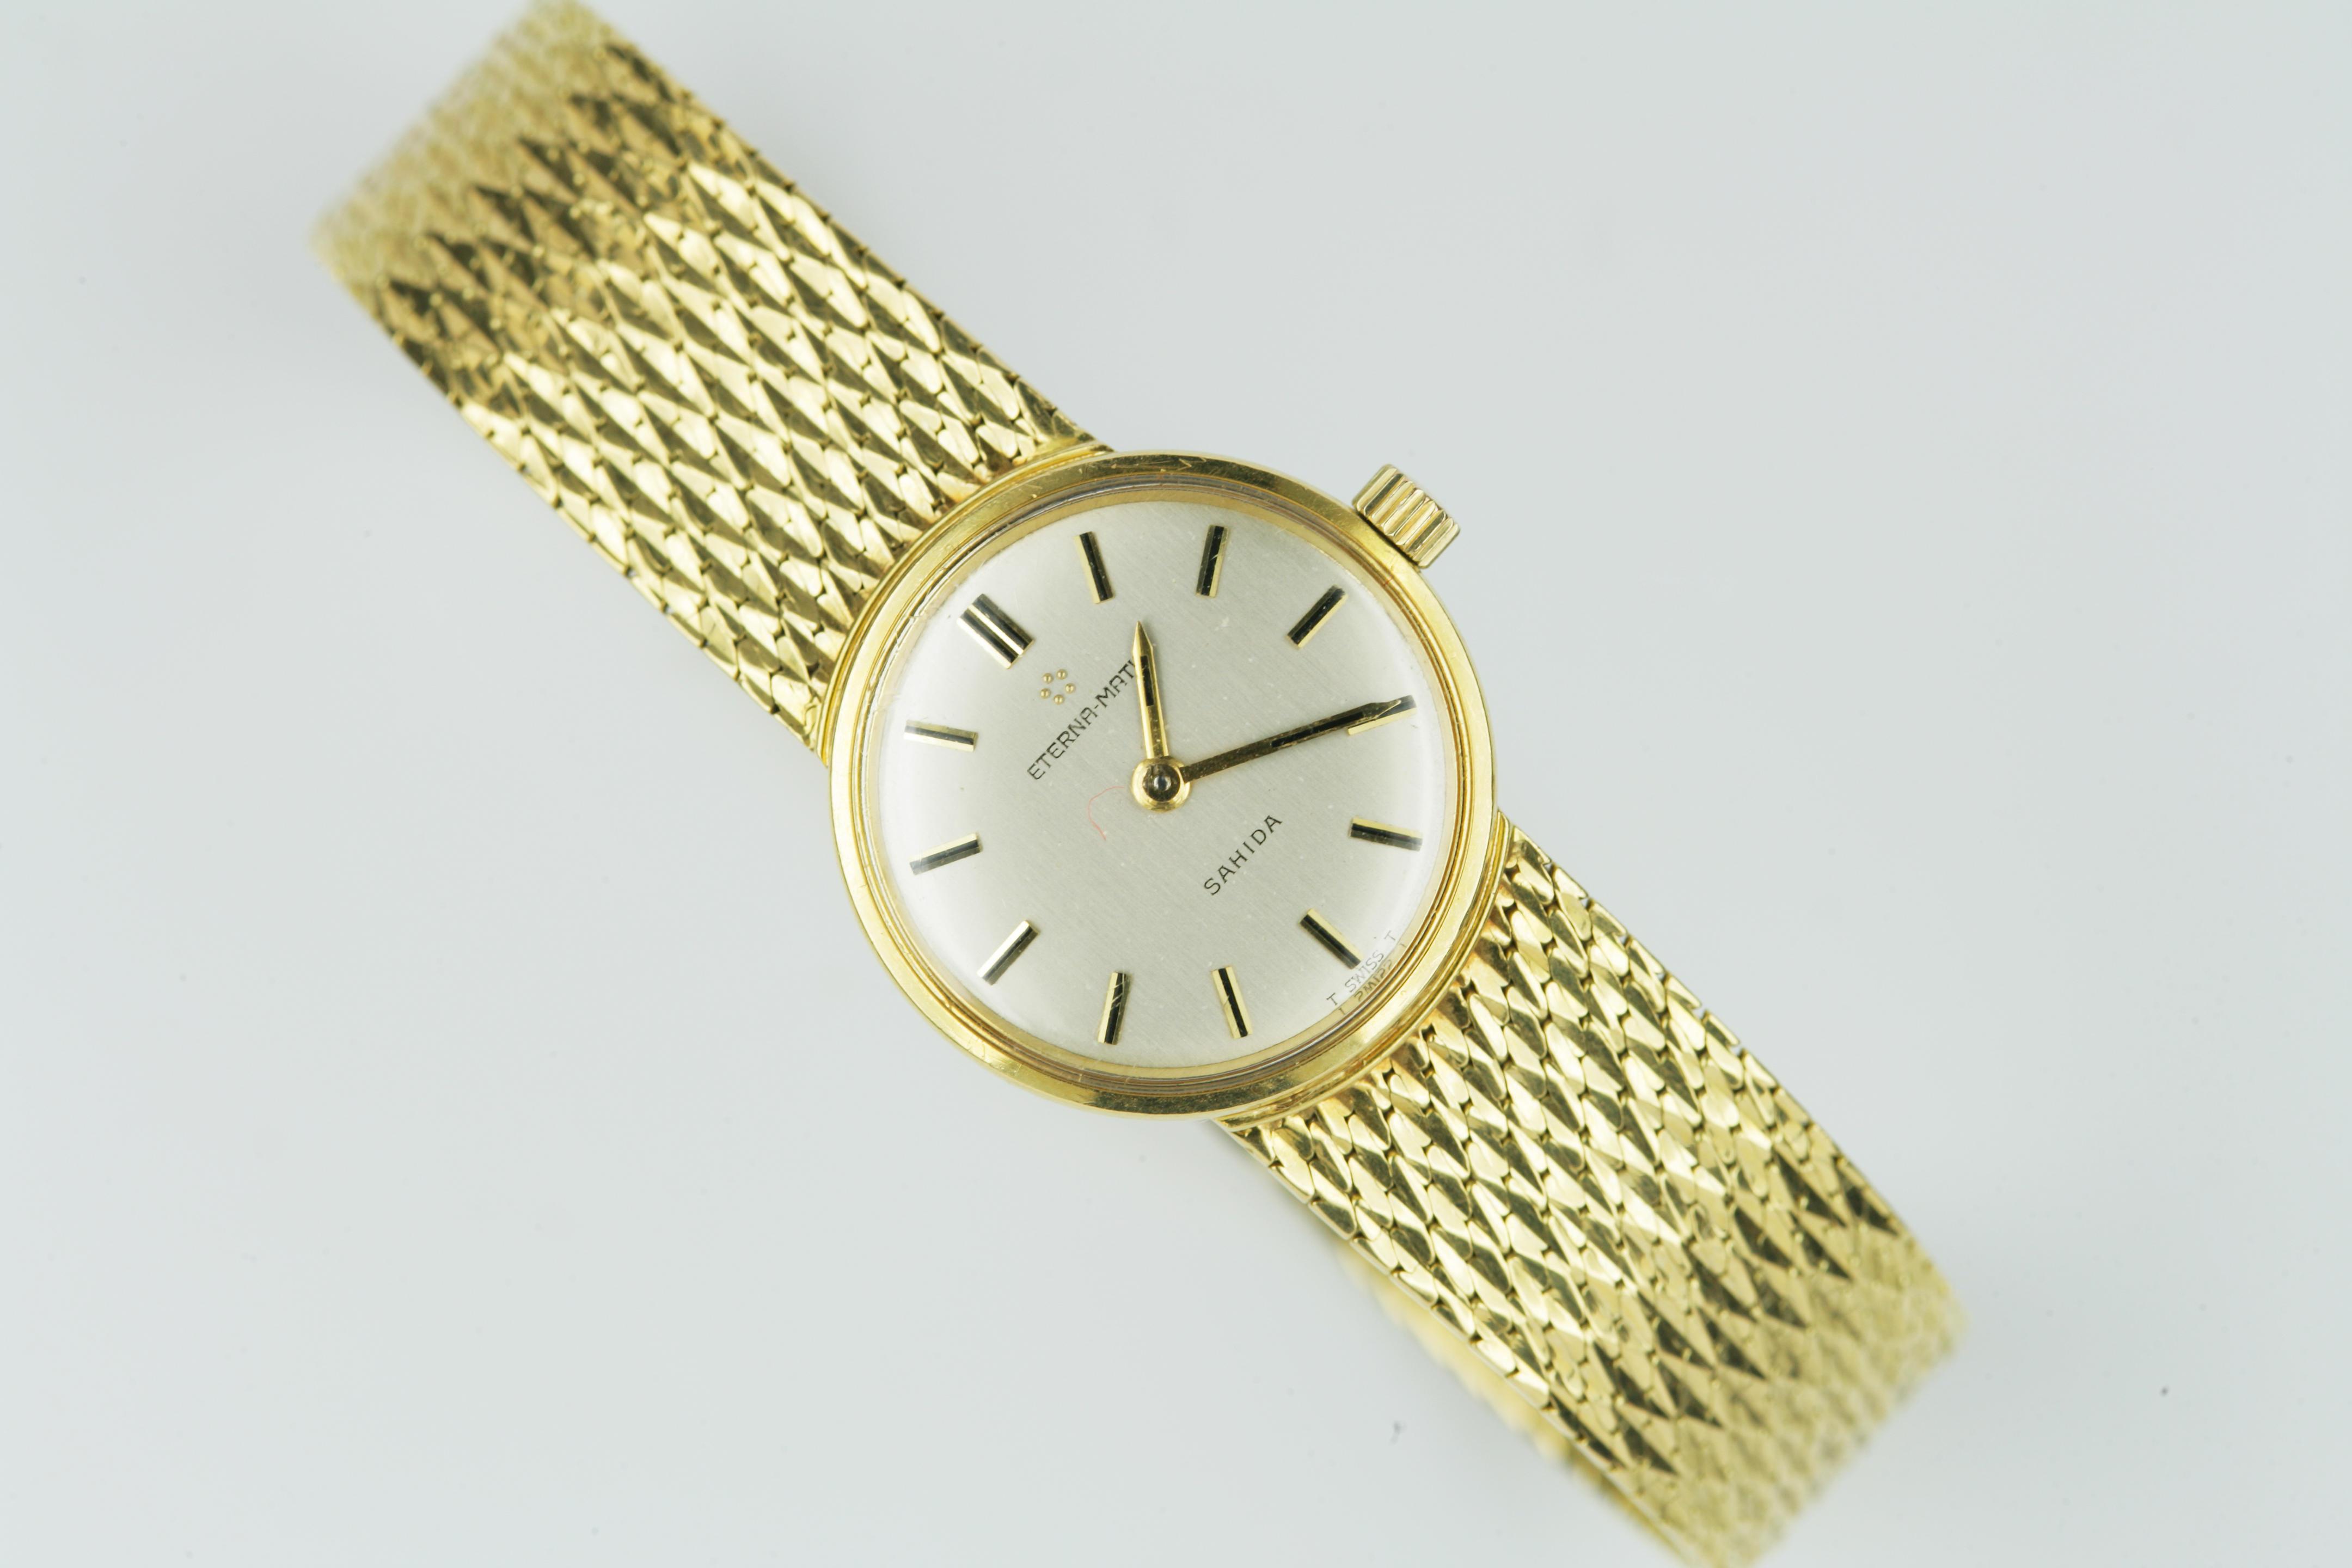 A lady's 18ct gold wristwatch, by Eterna